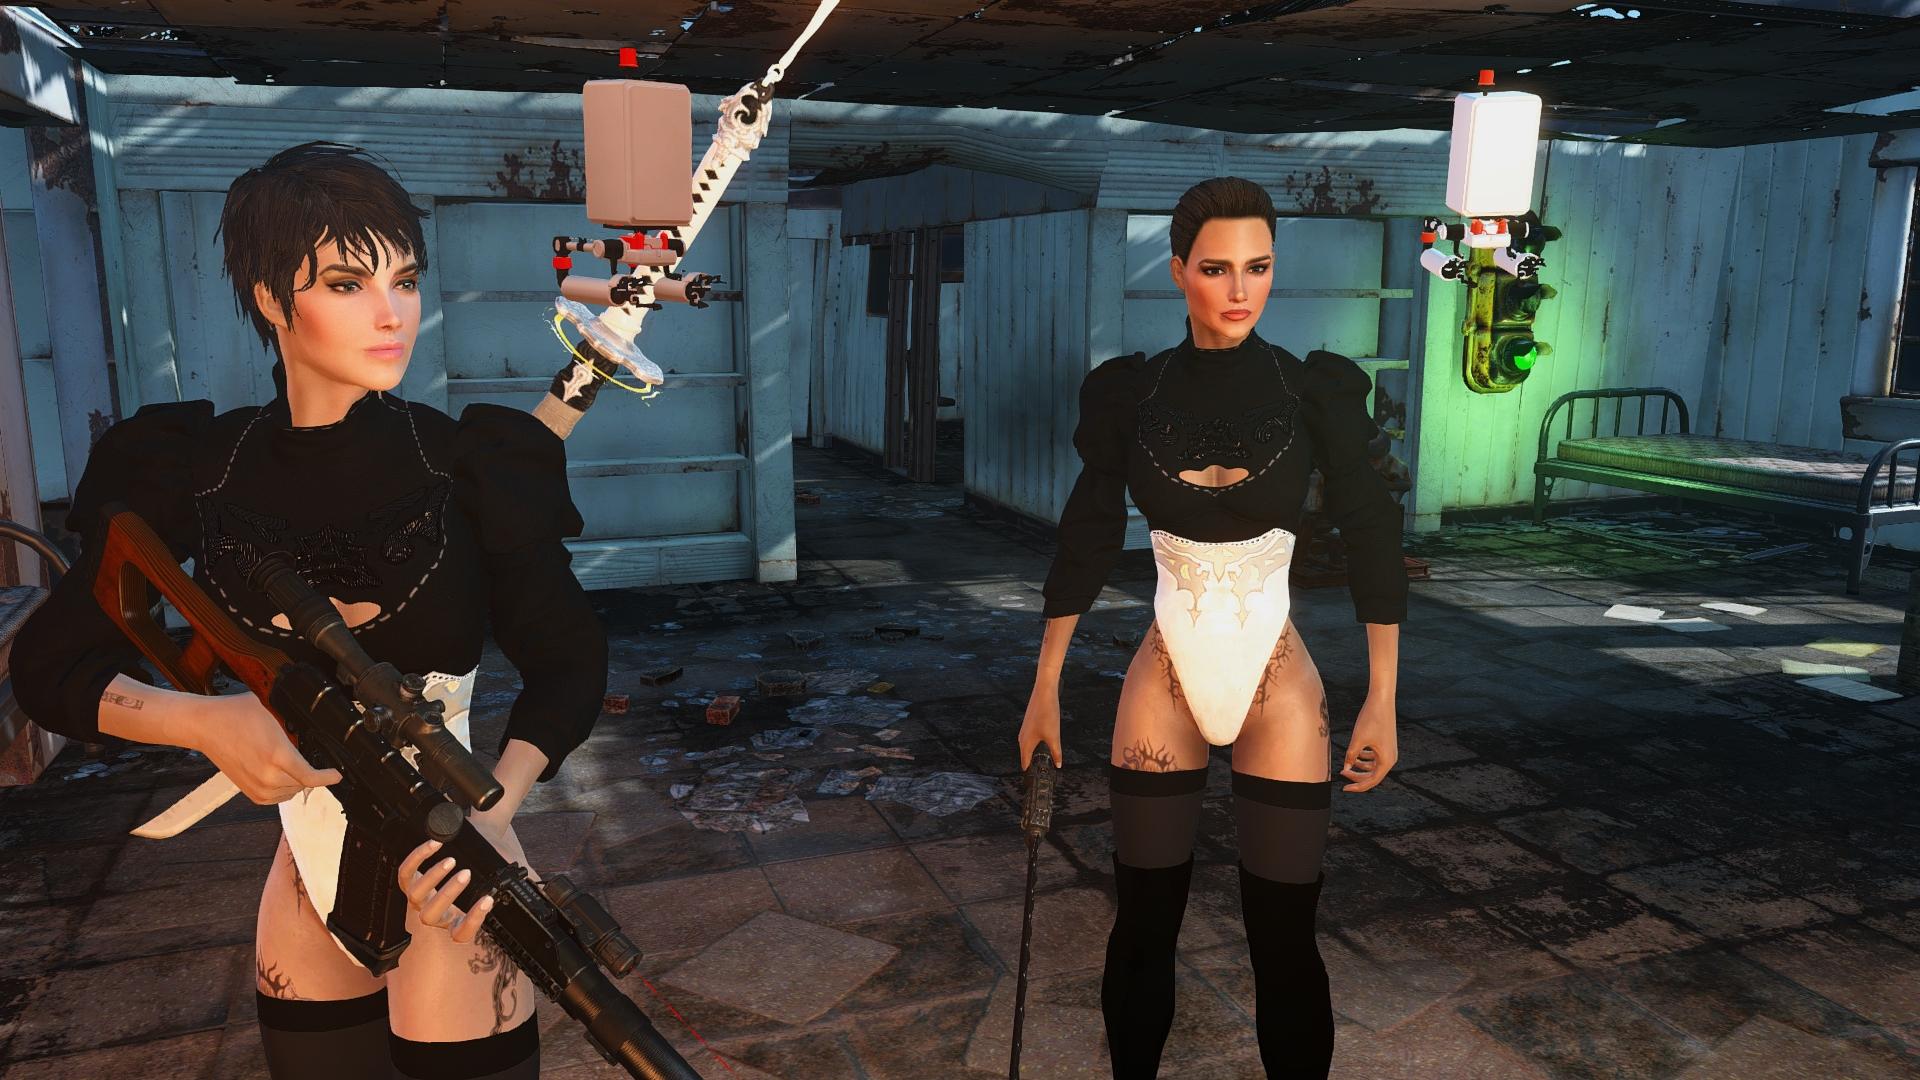 00034.Jpg - Fallout 4